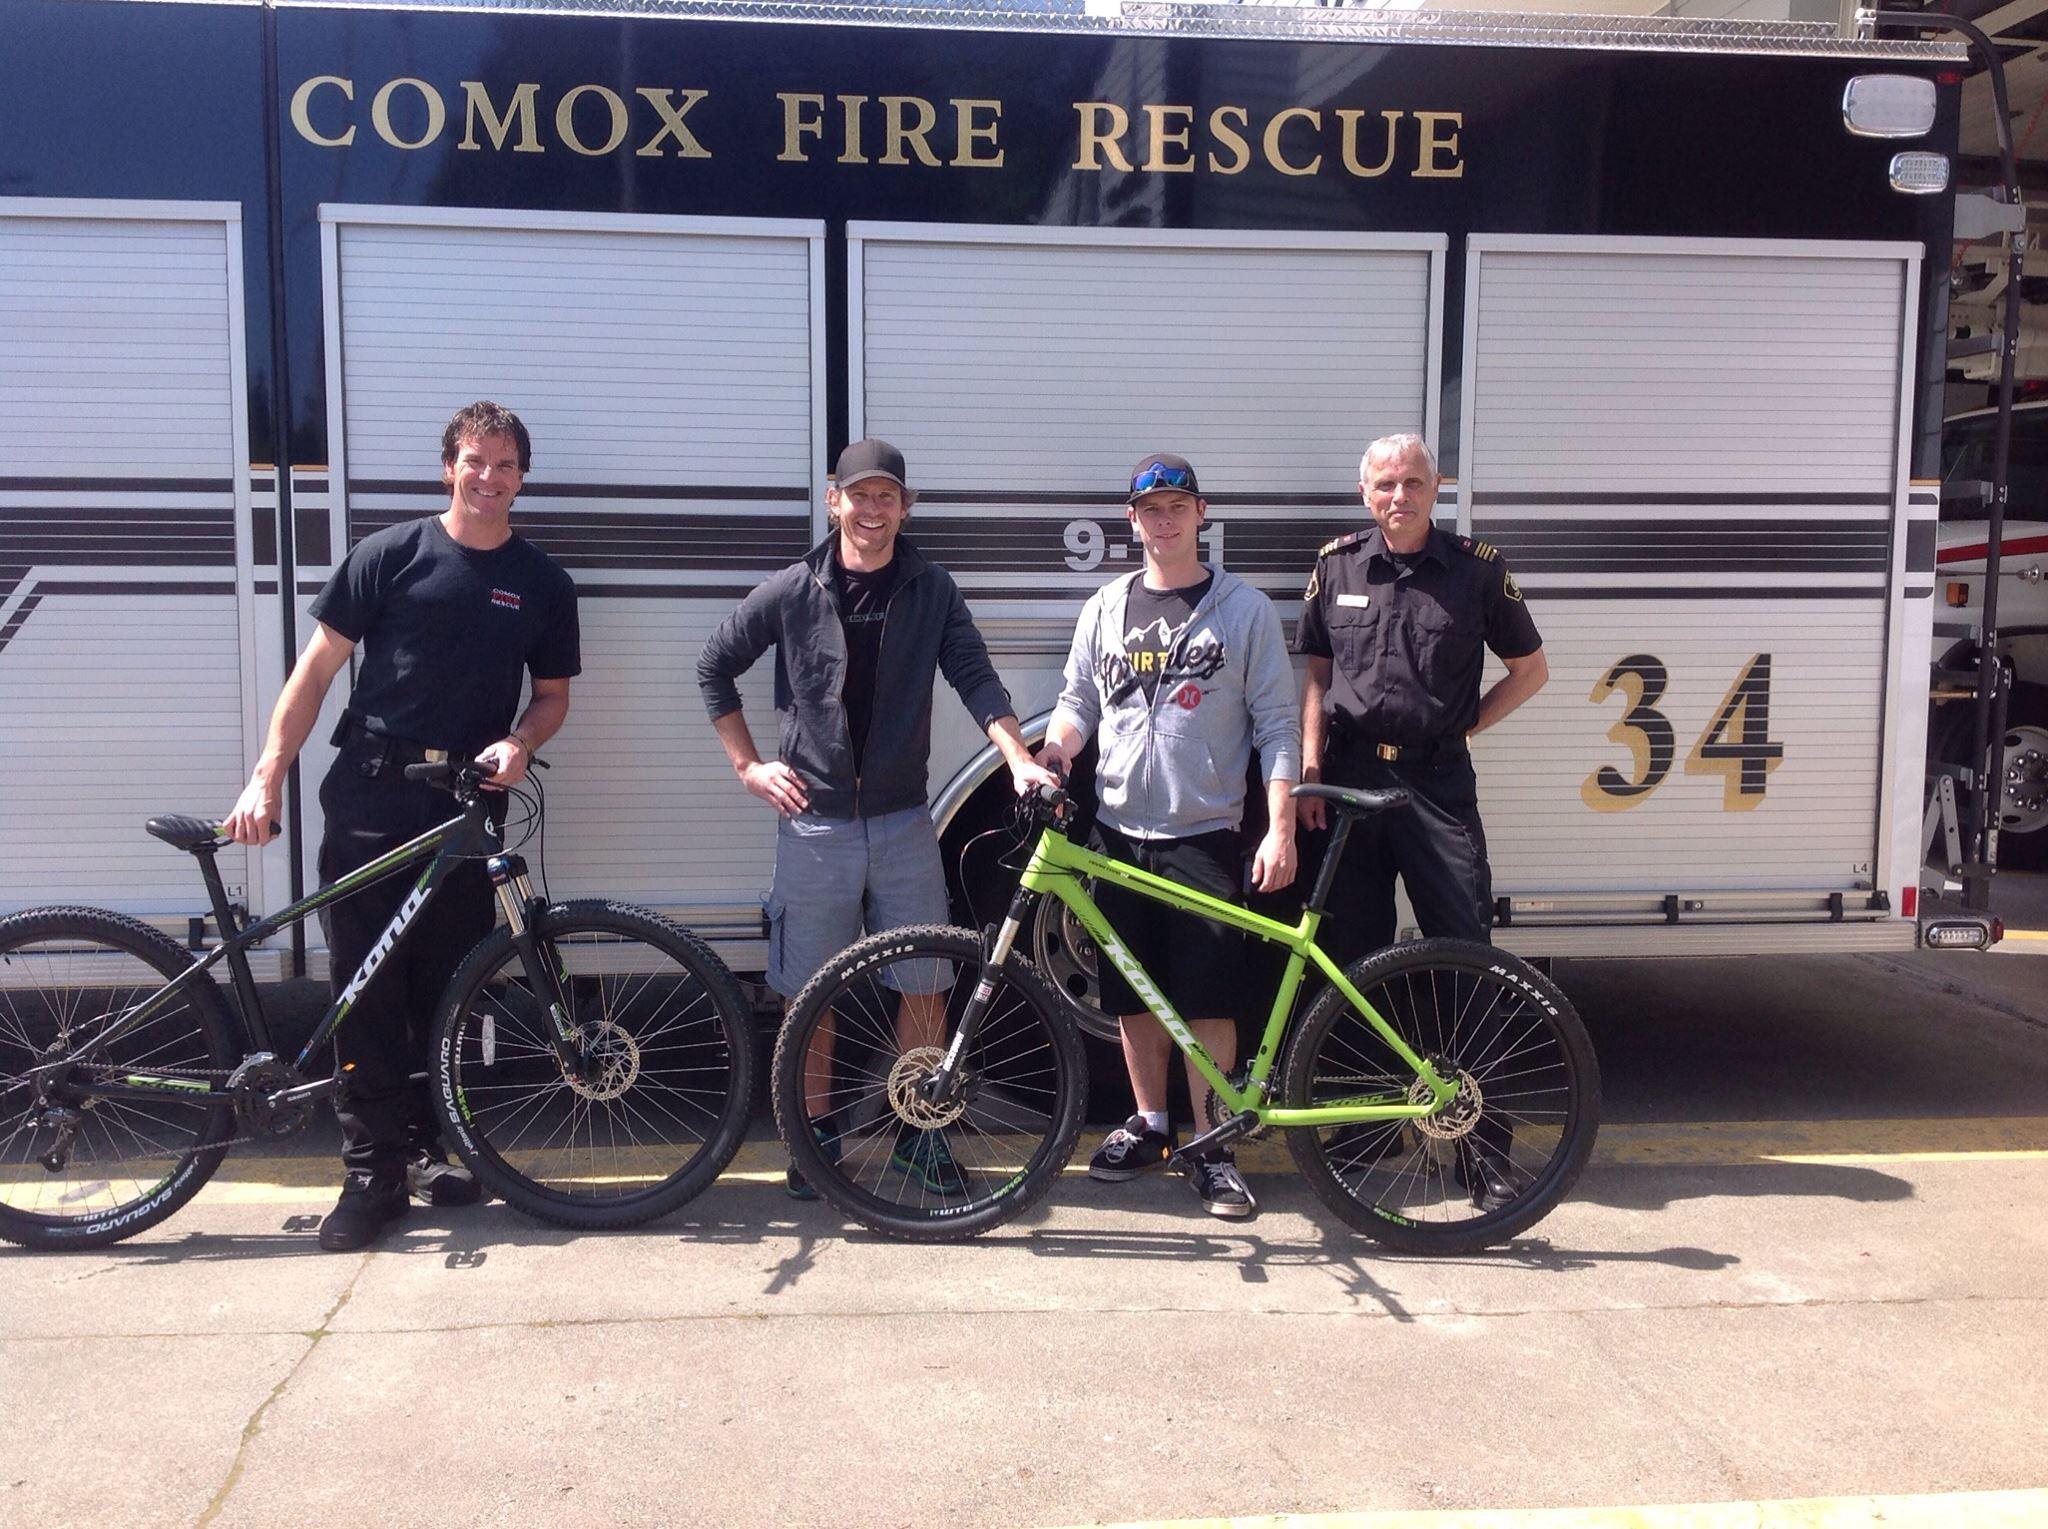 comox-fire-rescue-mountain-bikes-1.jpg